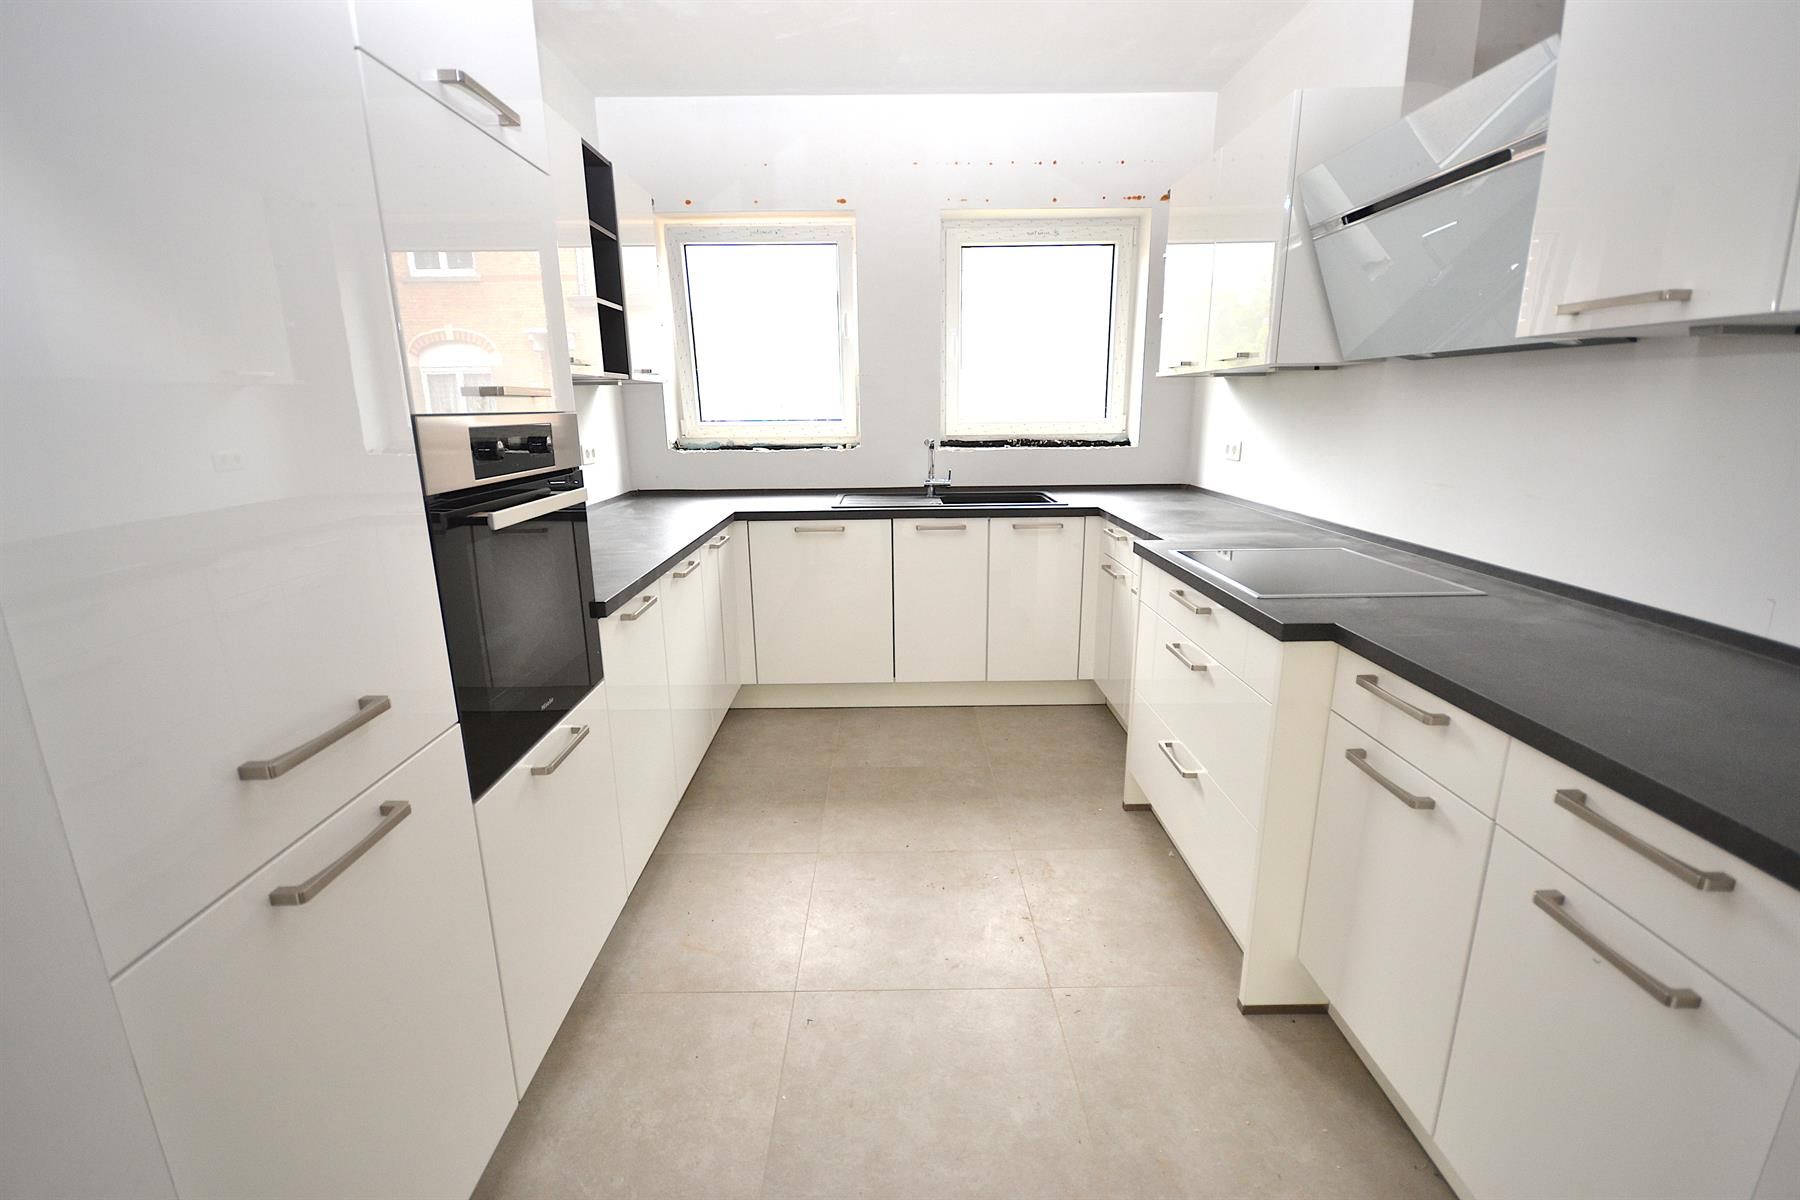 Maison - Berloz Rosoux-Crenwick - #3877804-3